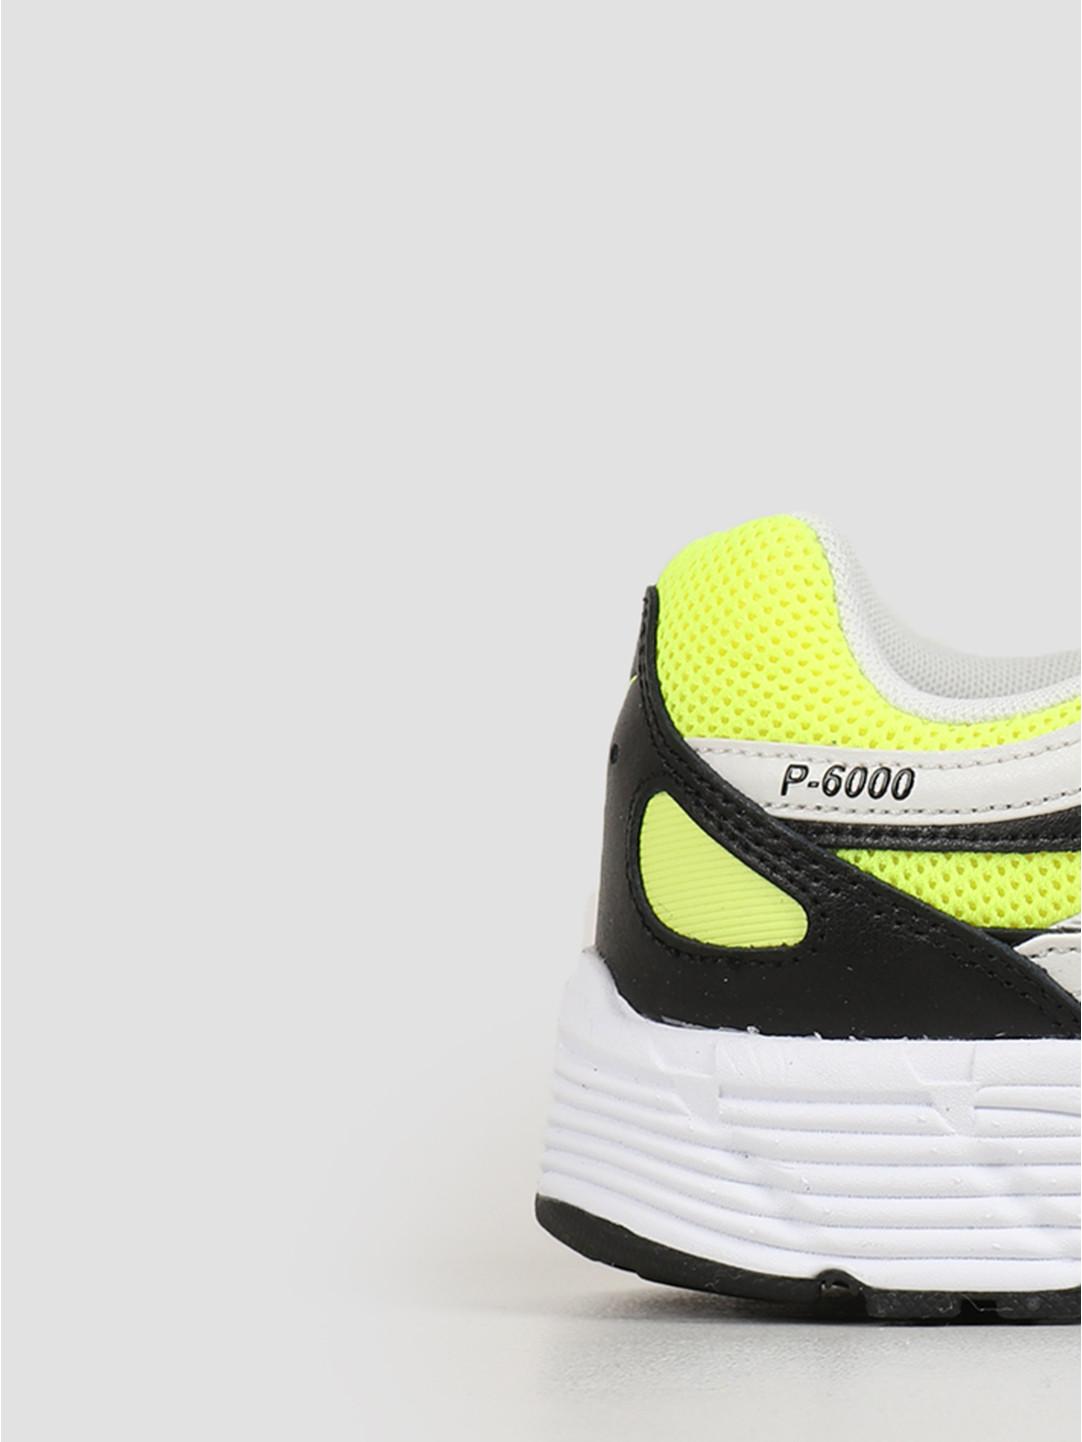 Nike Nike P 6000 Black Lemon Venom Platinum Tint White CD6404-007